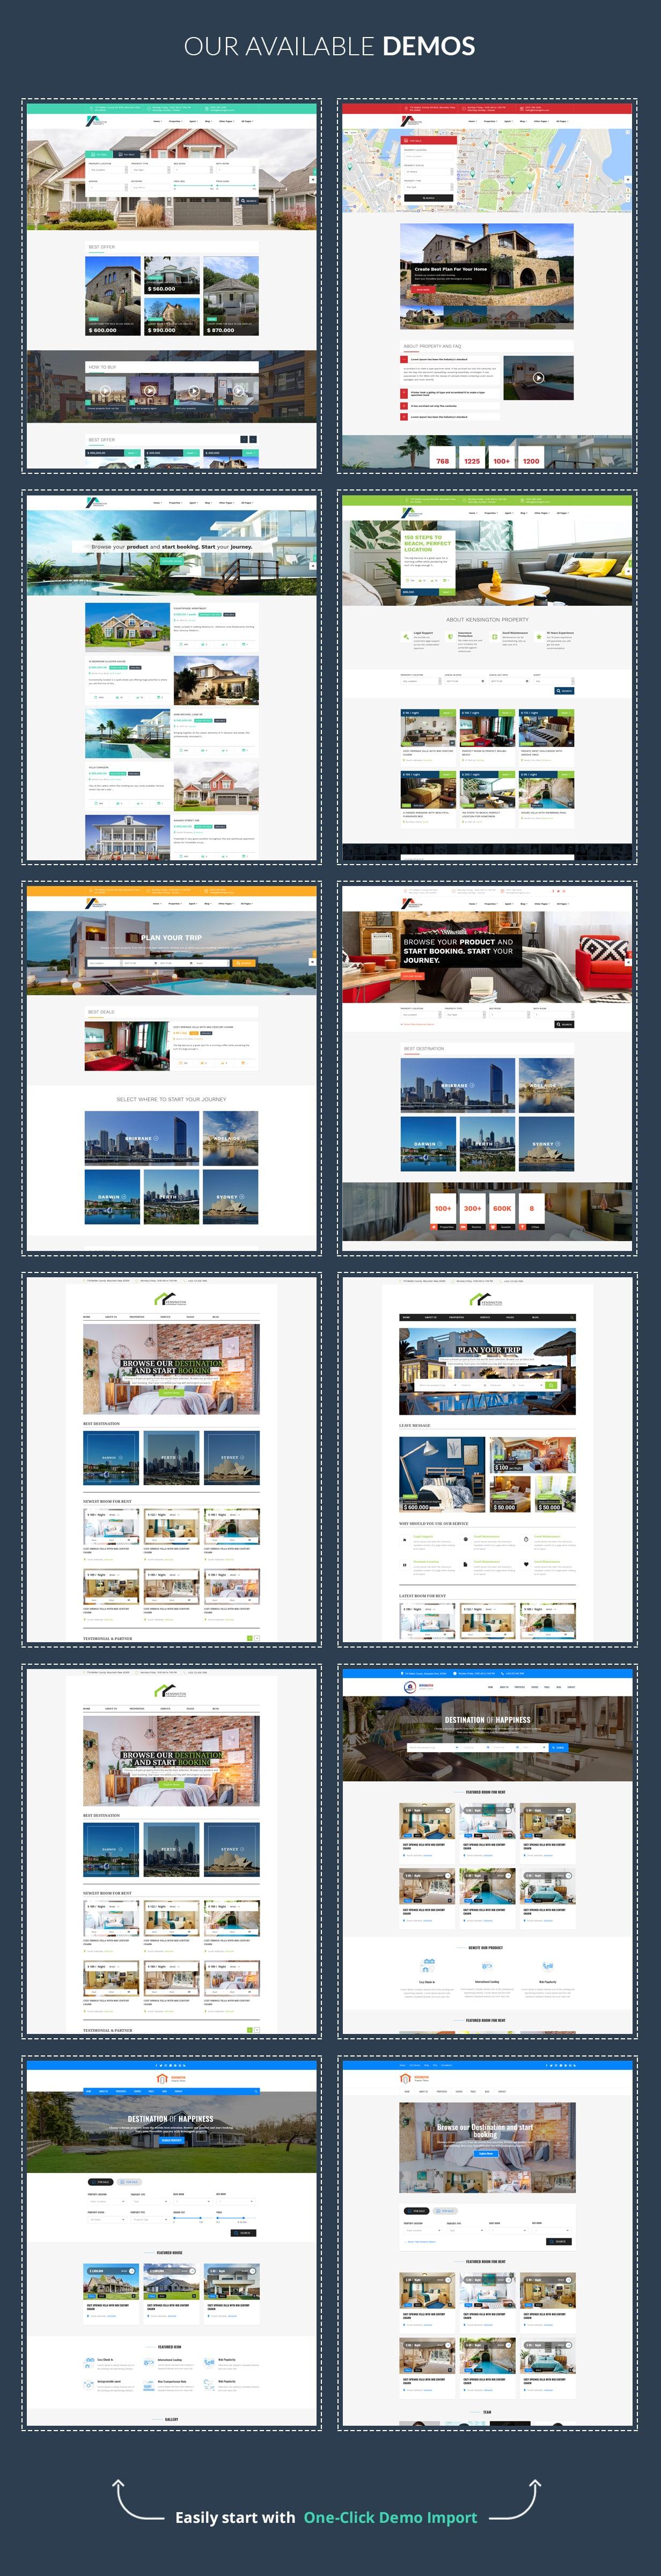 Kensington - Immobilien- und Immobilienmanagement WordPress Theme - 7